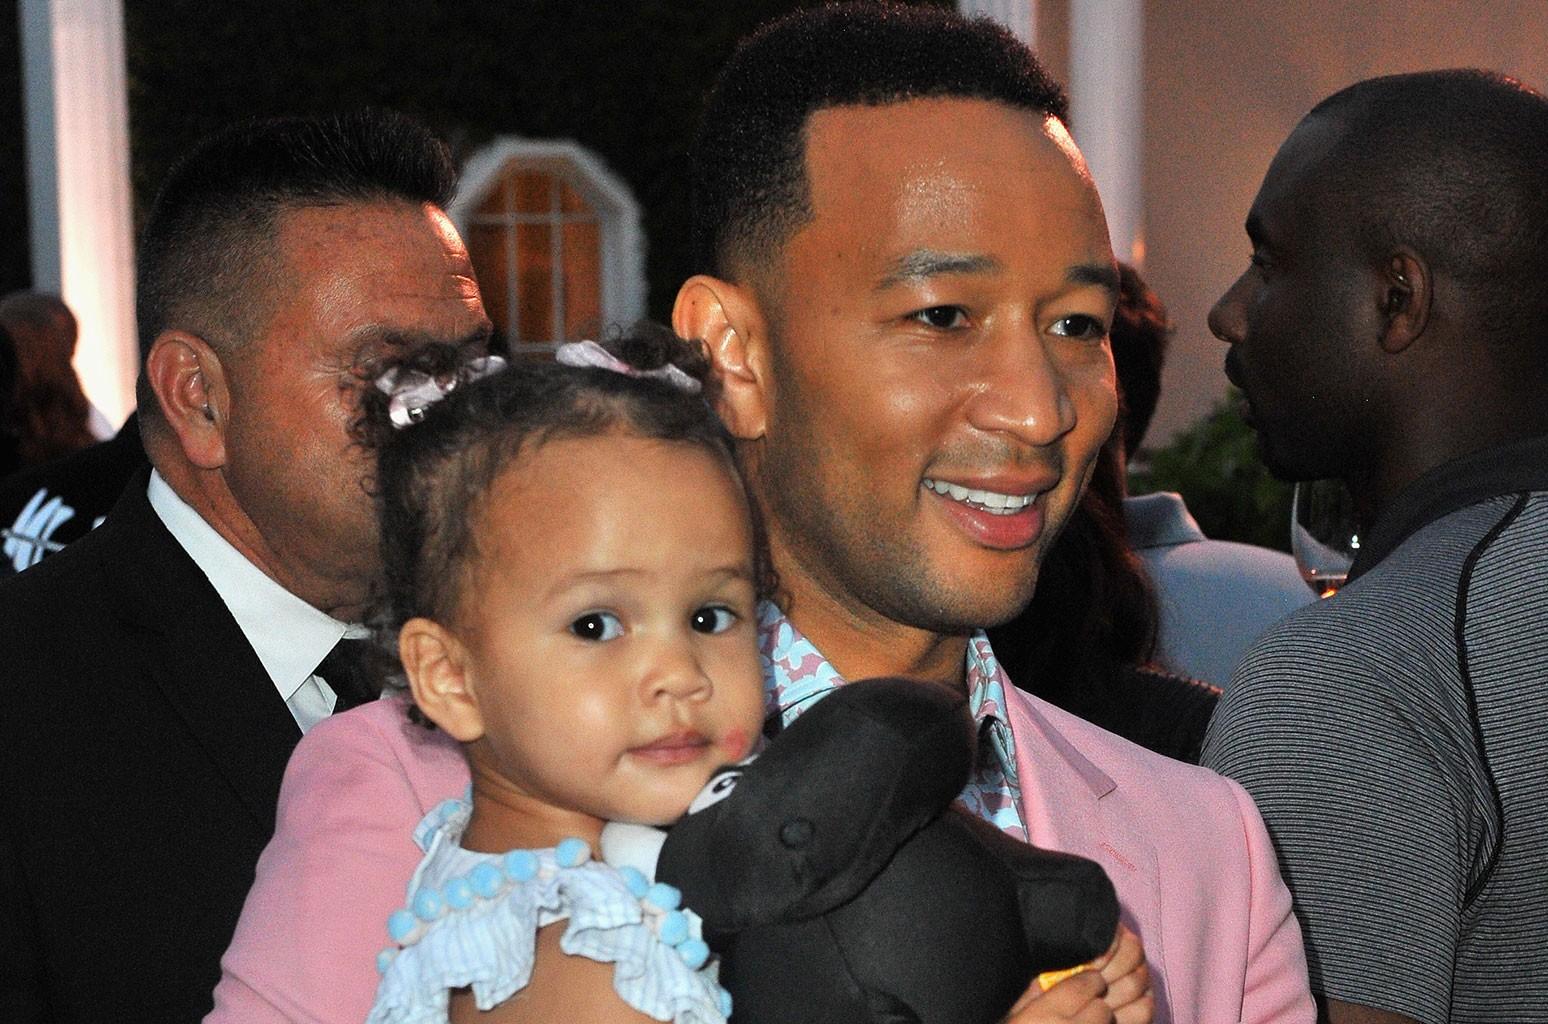 John Legend and his daughter, Luna